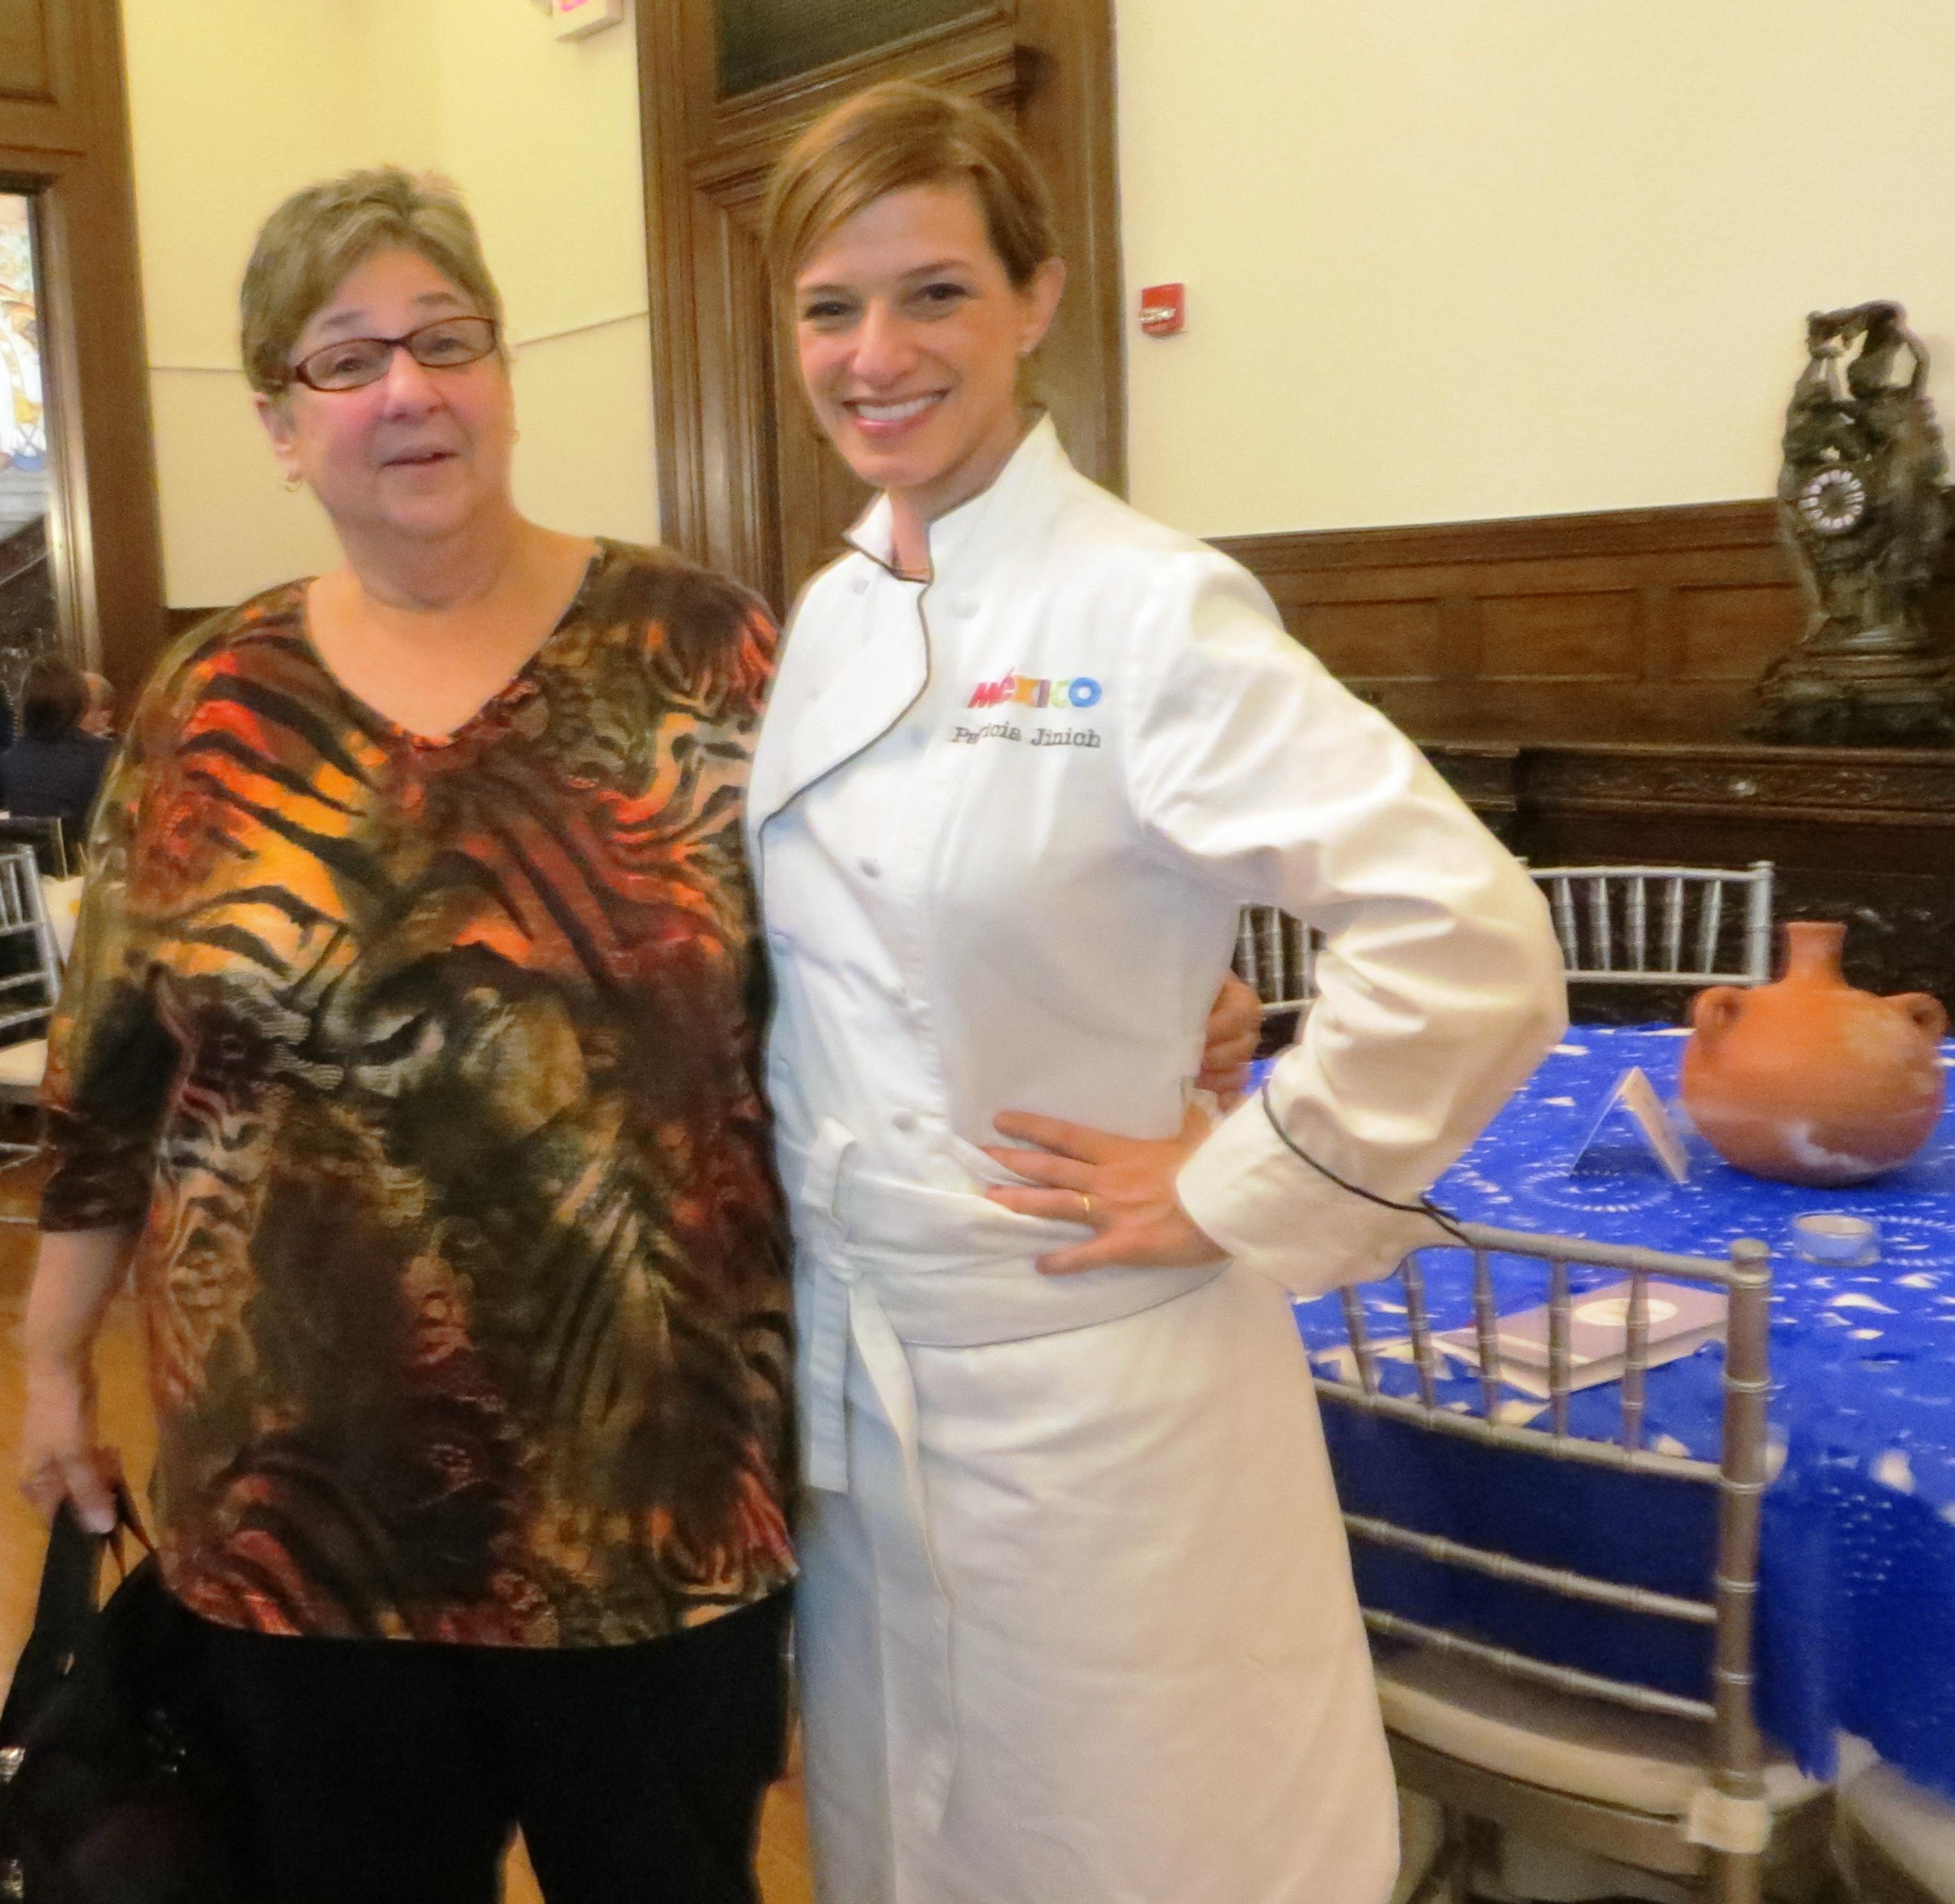 Pati Jinich's Culinary Program At The MCI